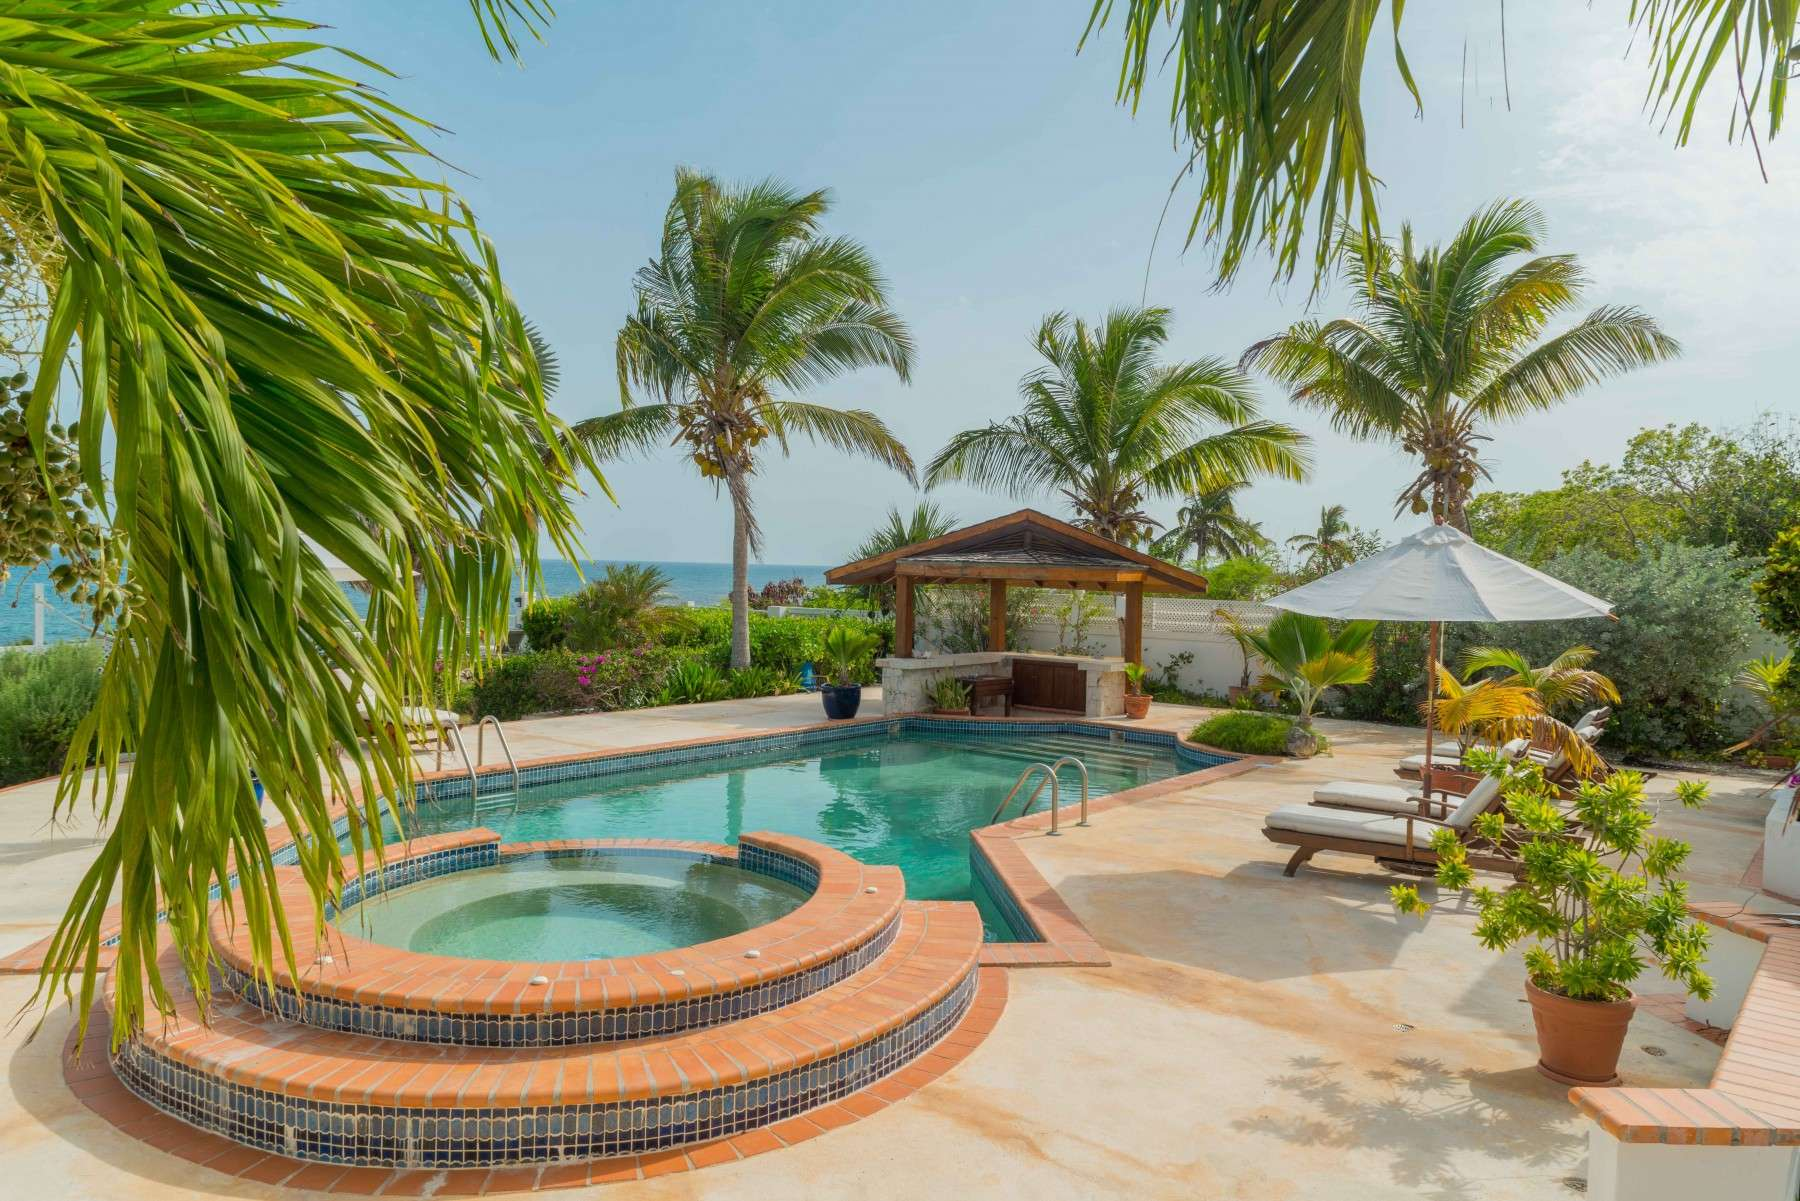 Luxury villa rentals caribbean - Anguilla - Blowing point - No location 4 - Coyaba - Image 1/11